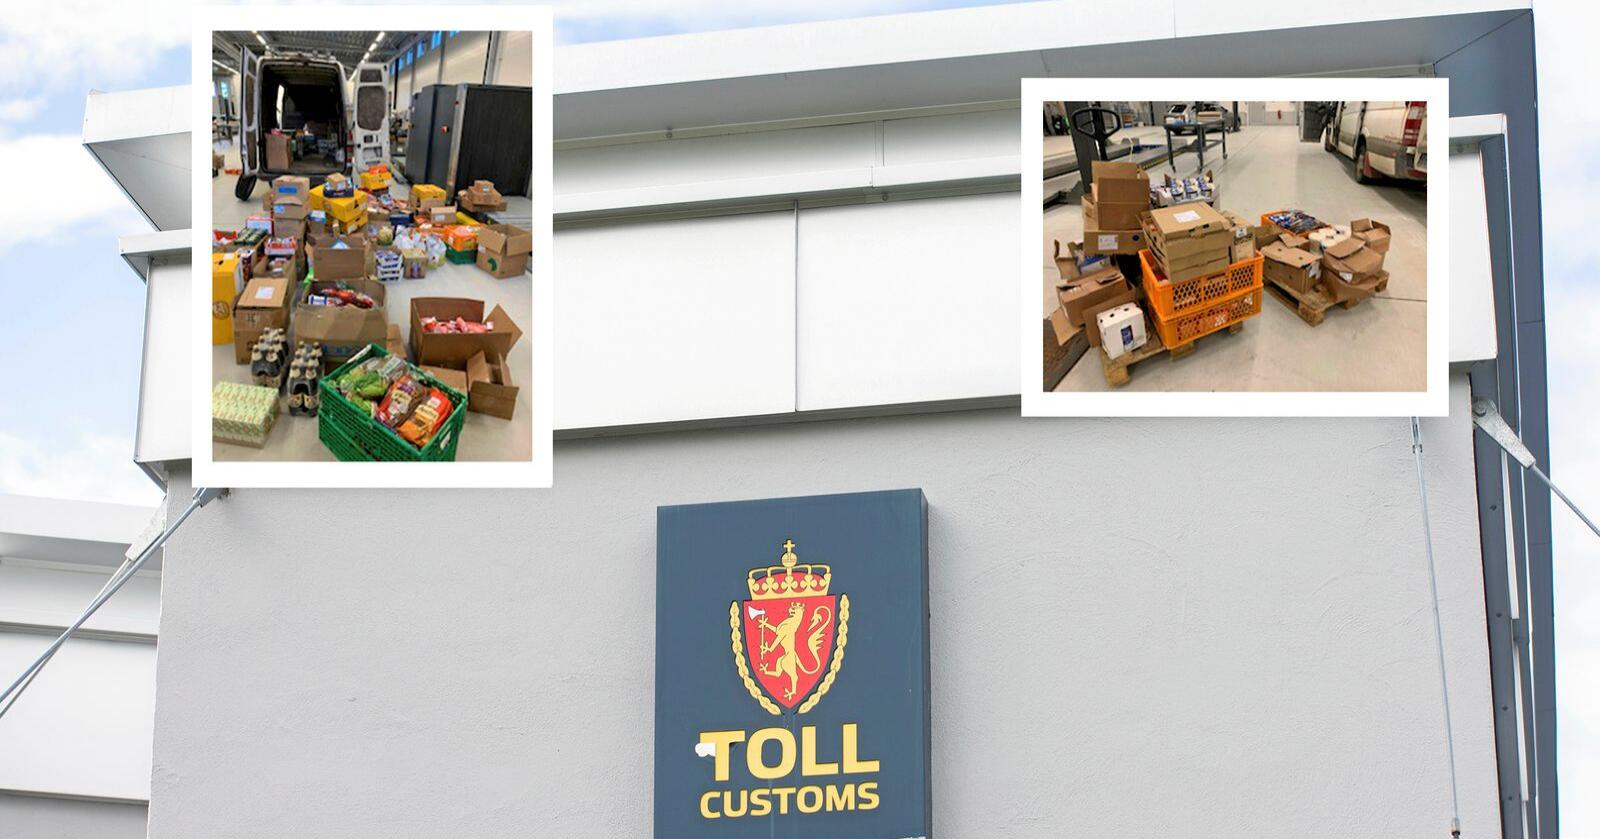 Kjøttbeslag ved tollen i Kongsvinger og Svinesund. Foto: Annika Byrde/NTB og Tolletaten